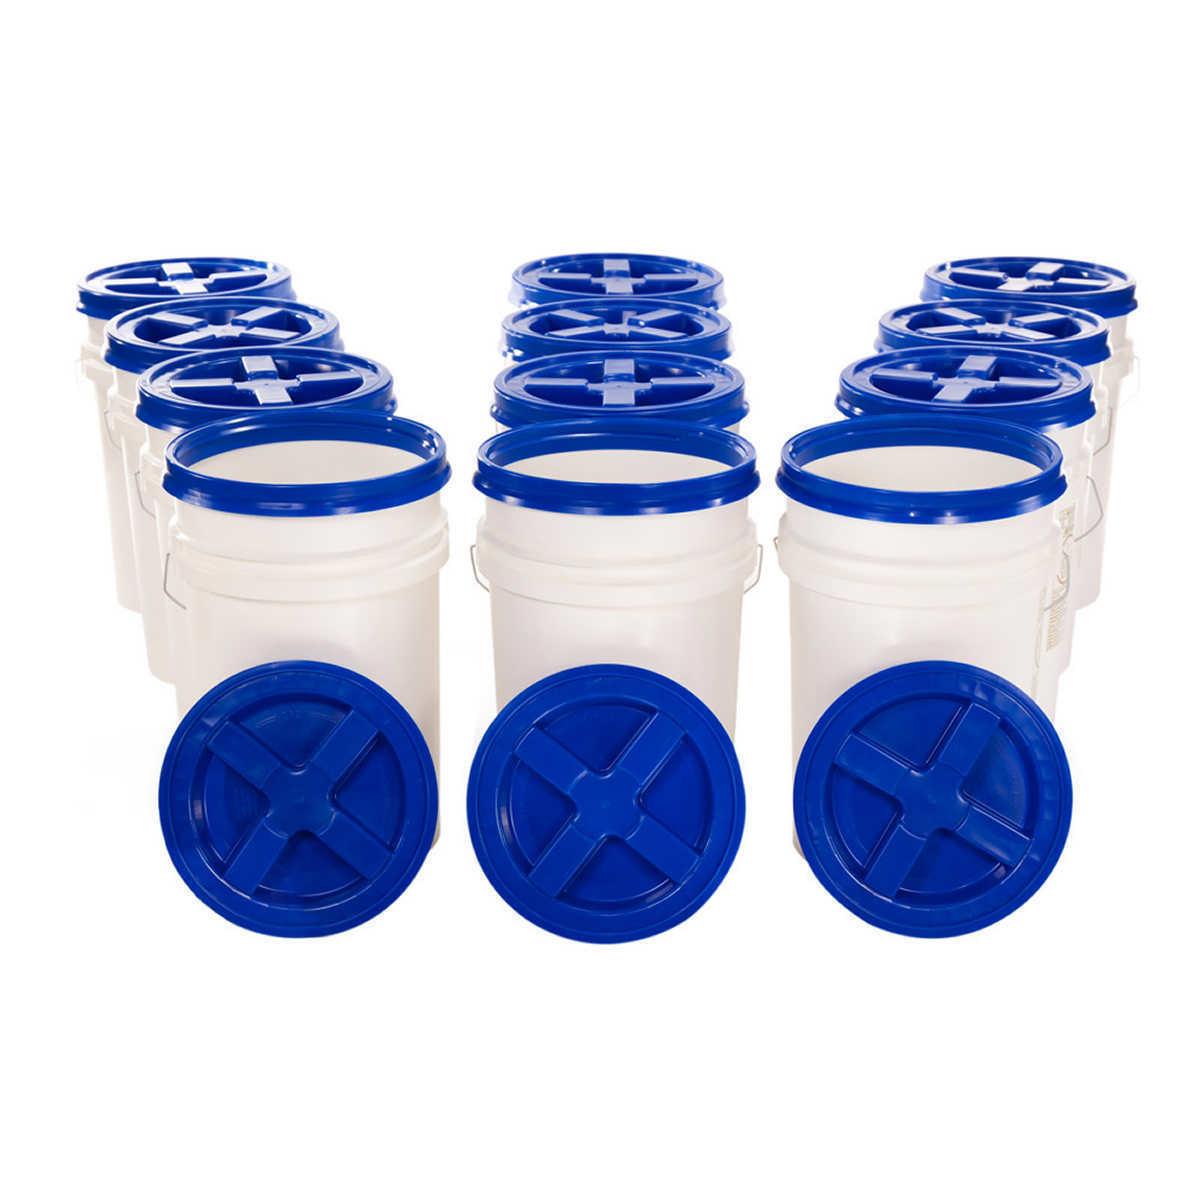 Nutristore 12 pack 6 Gallon Buckets w/ Gamma Seal Lids - Emergency Food Storage 1